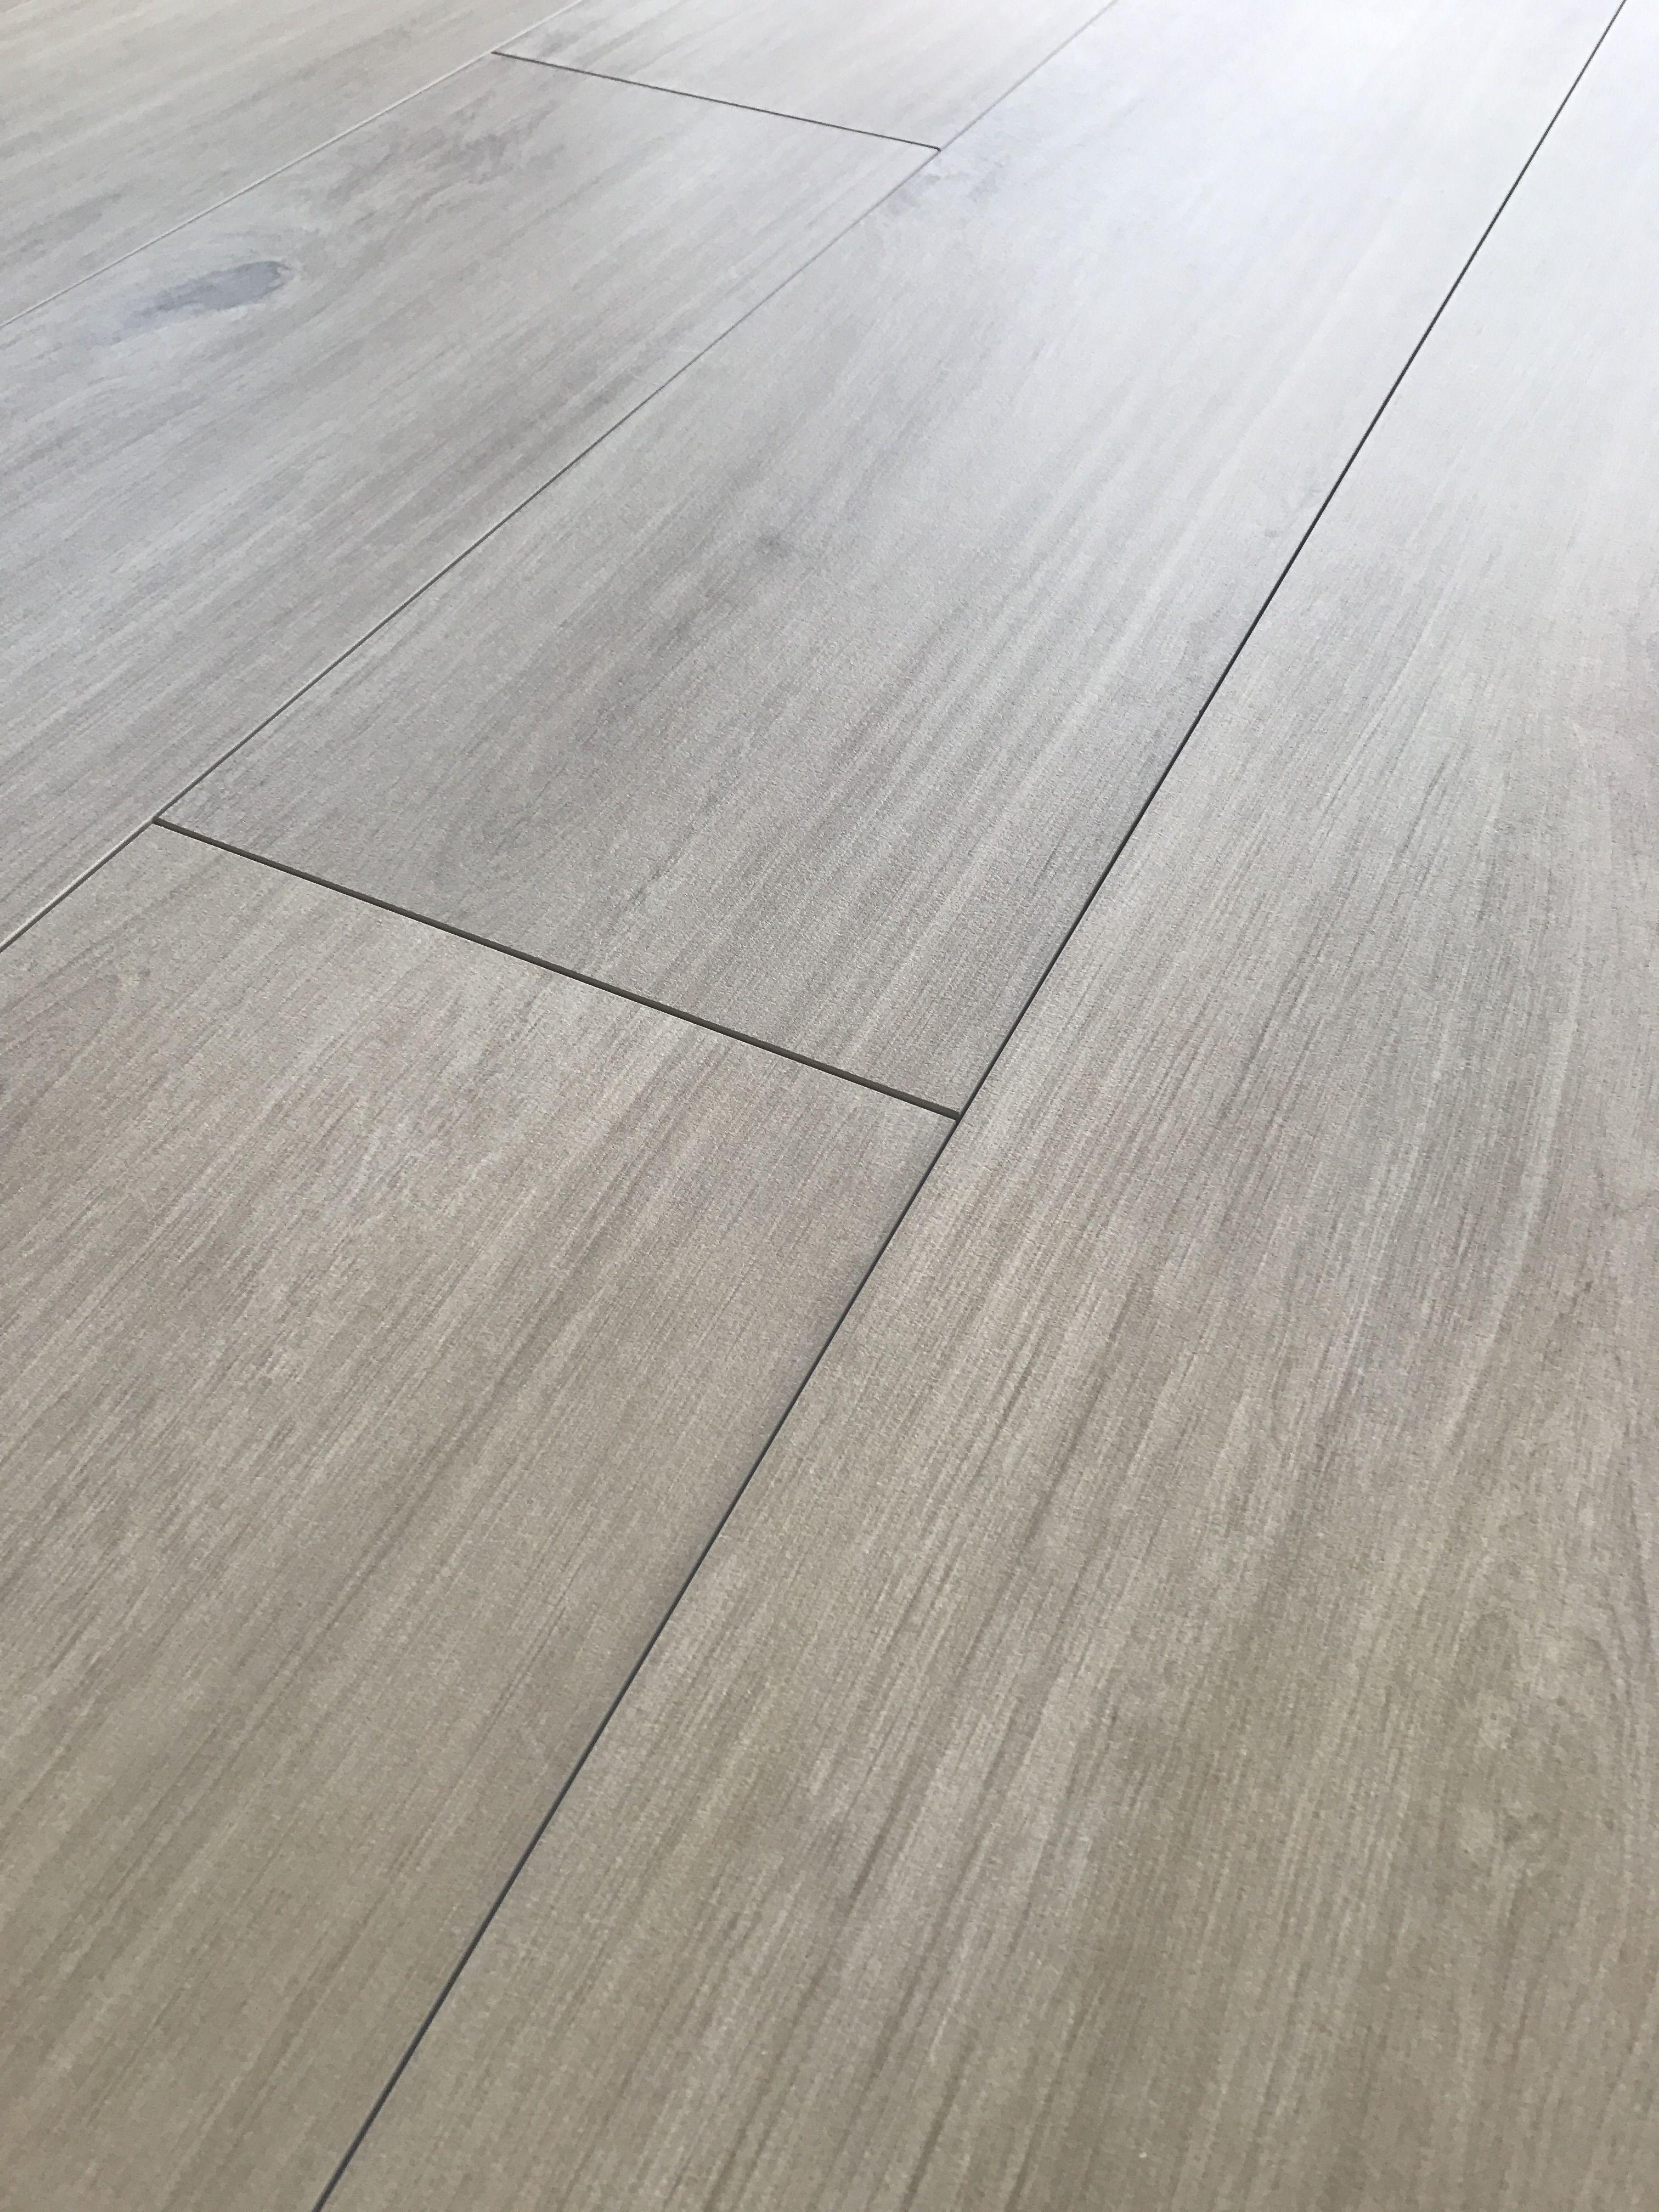 keramisch parket provenza oak rovere 180 cm noorderkwartier 2017